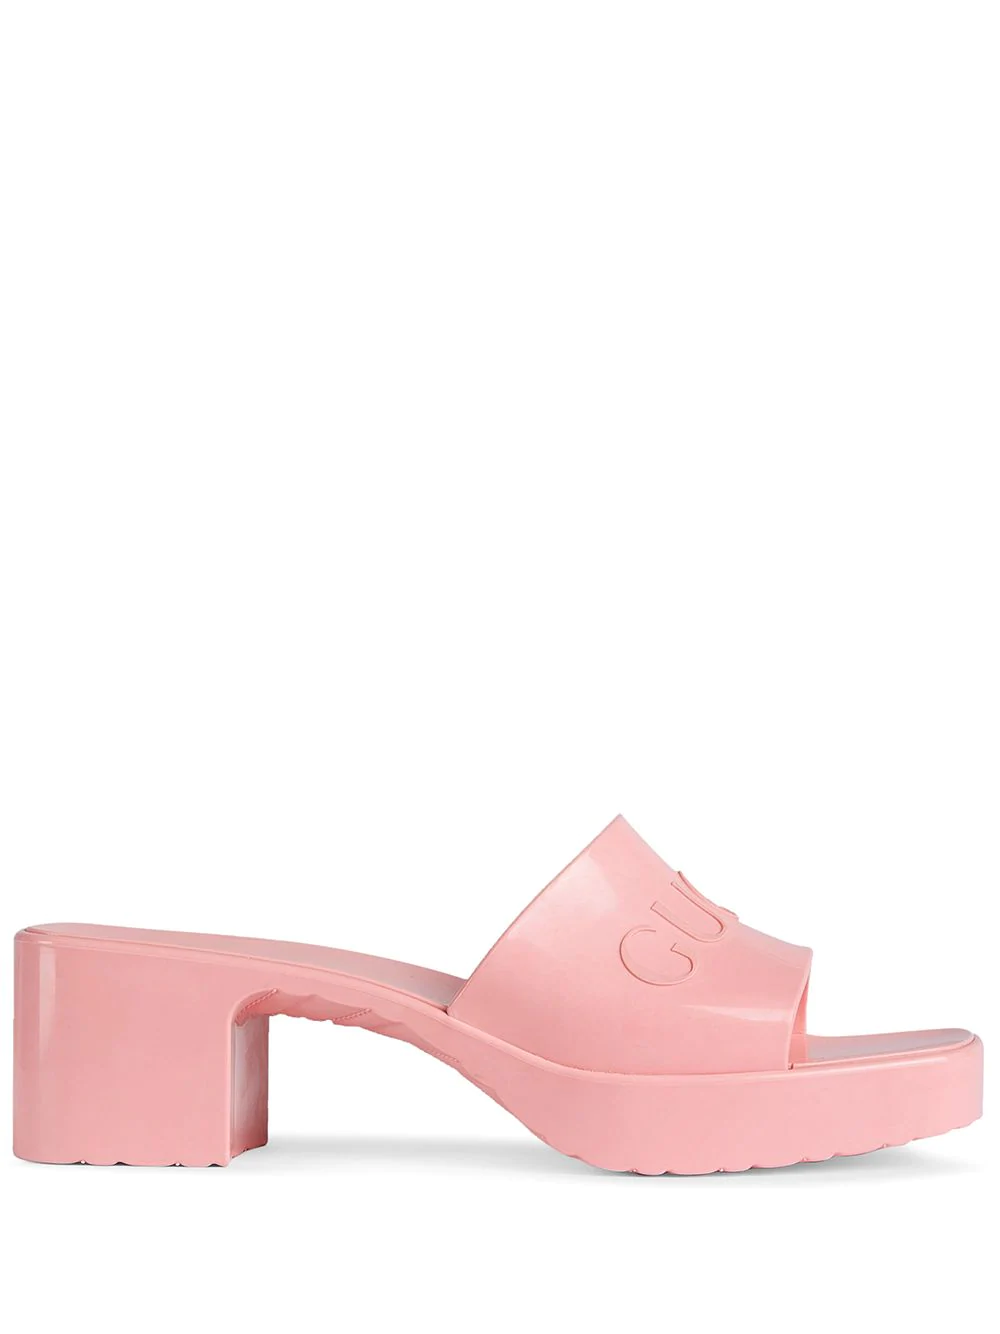 Gucci Logo Embossed Sandals 566лв